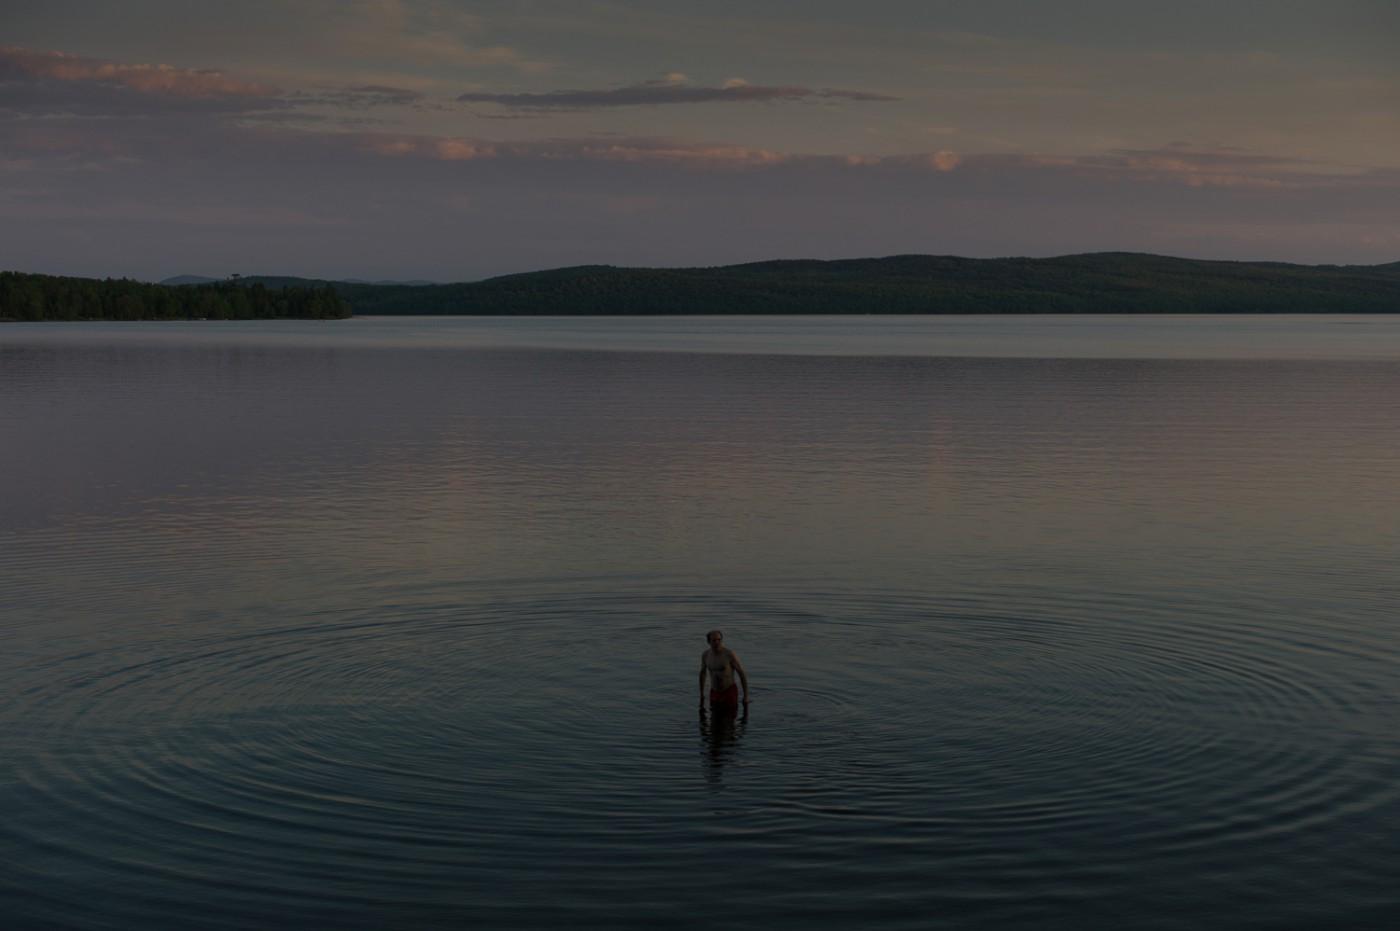 Michel Huneault, </span><span><em>Jacques. First swim of the year in Lac Mégantic</em>, </span><span>June 2014